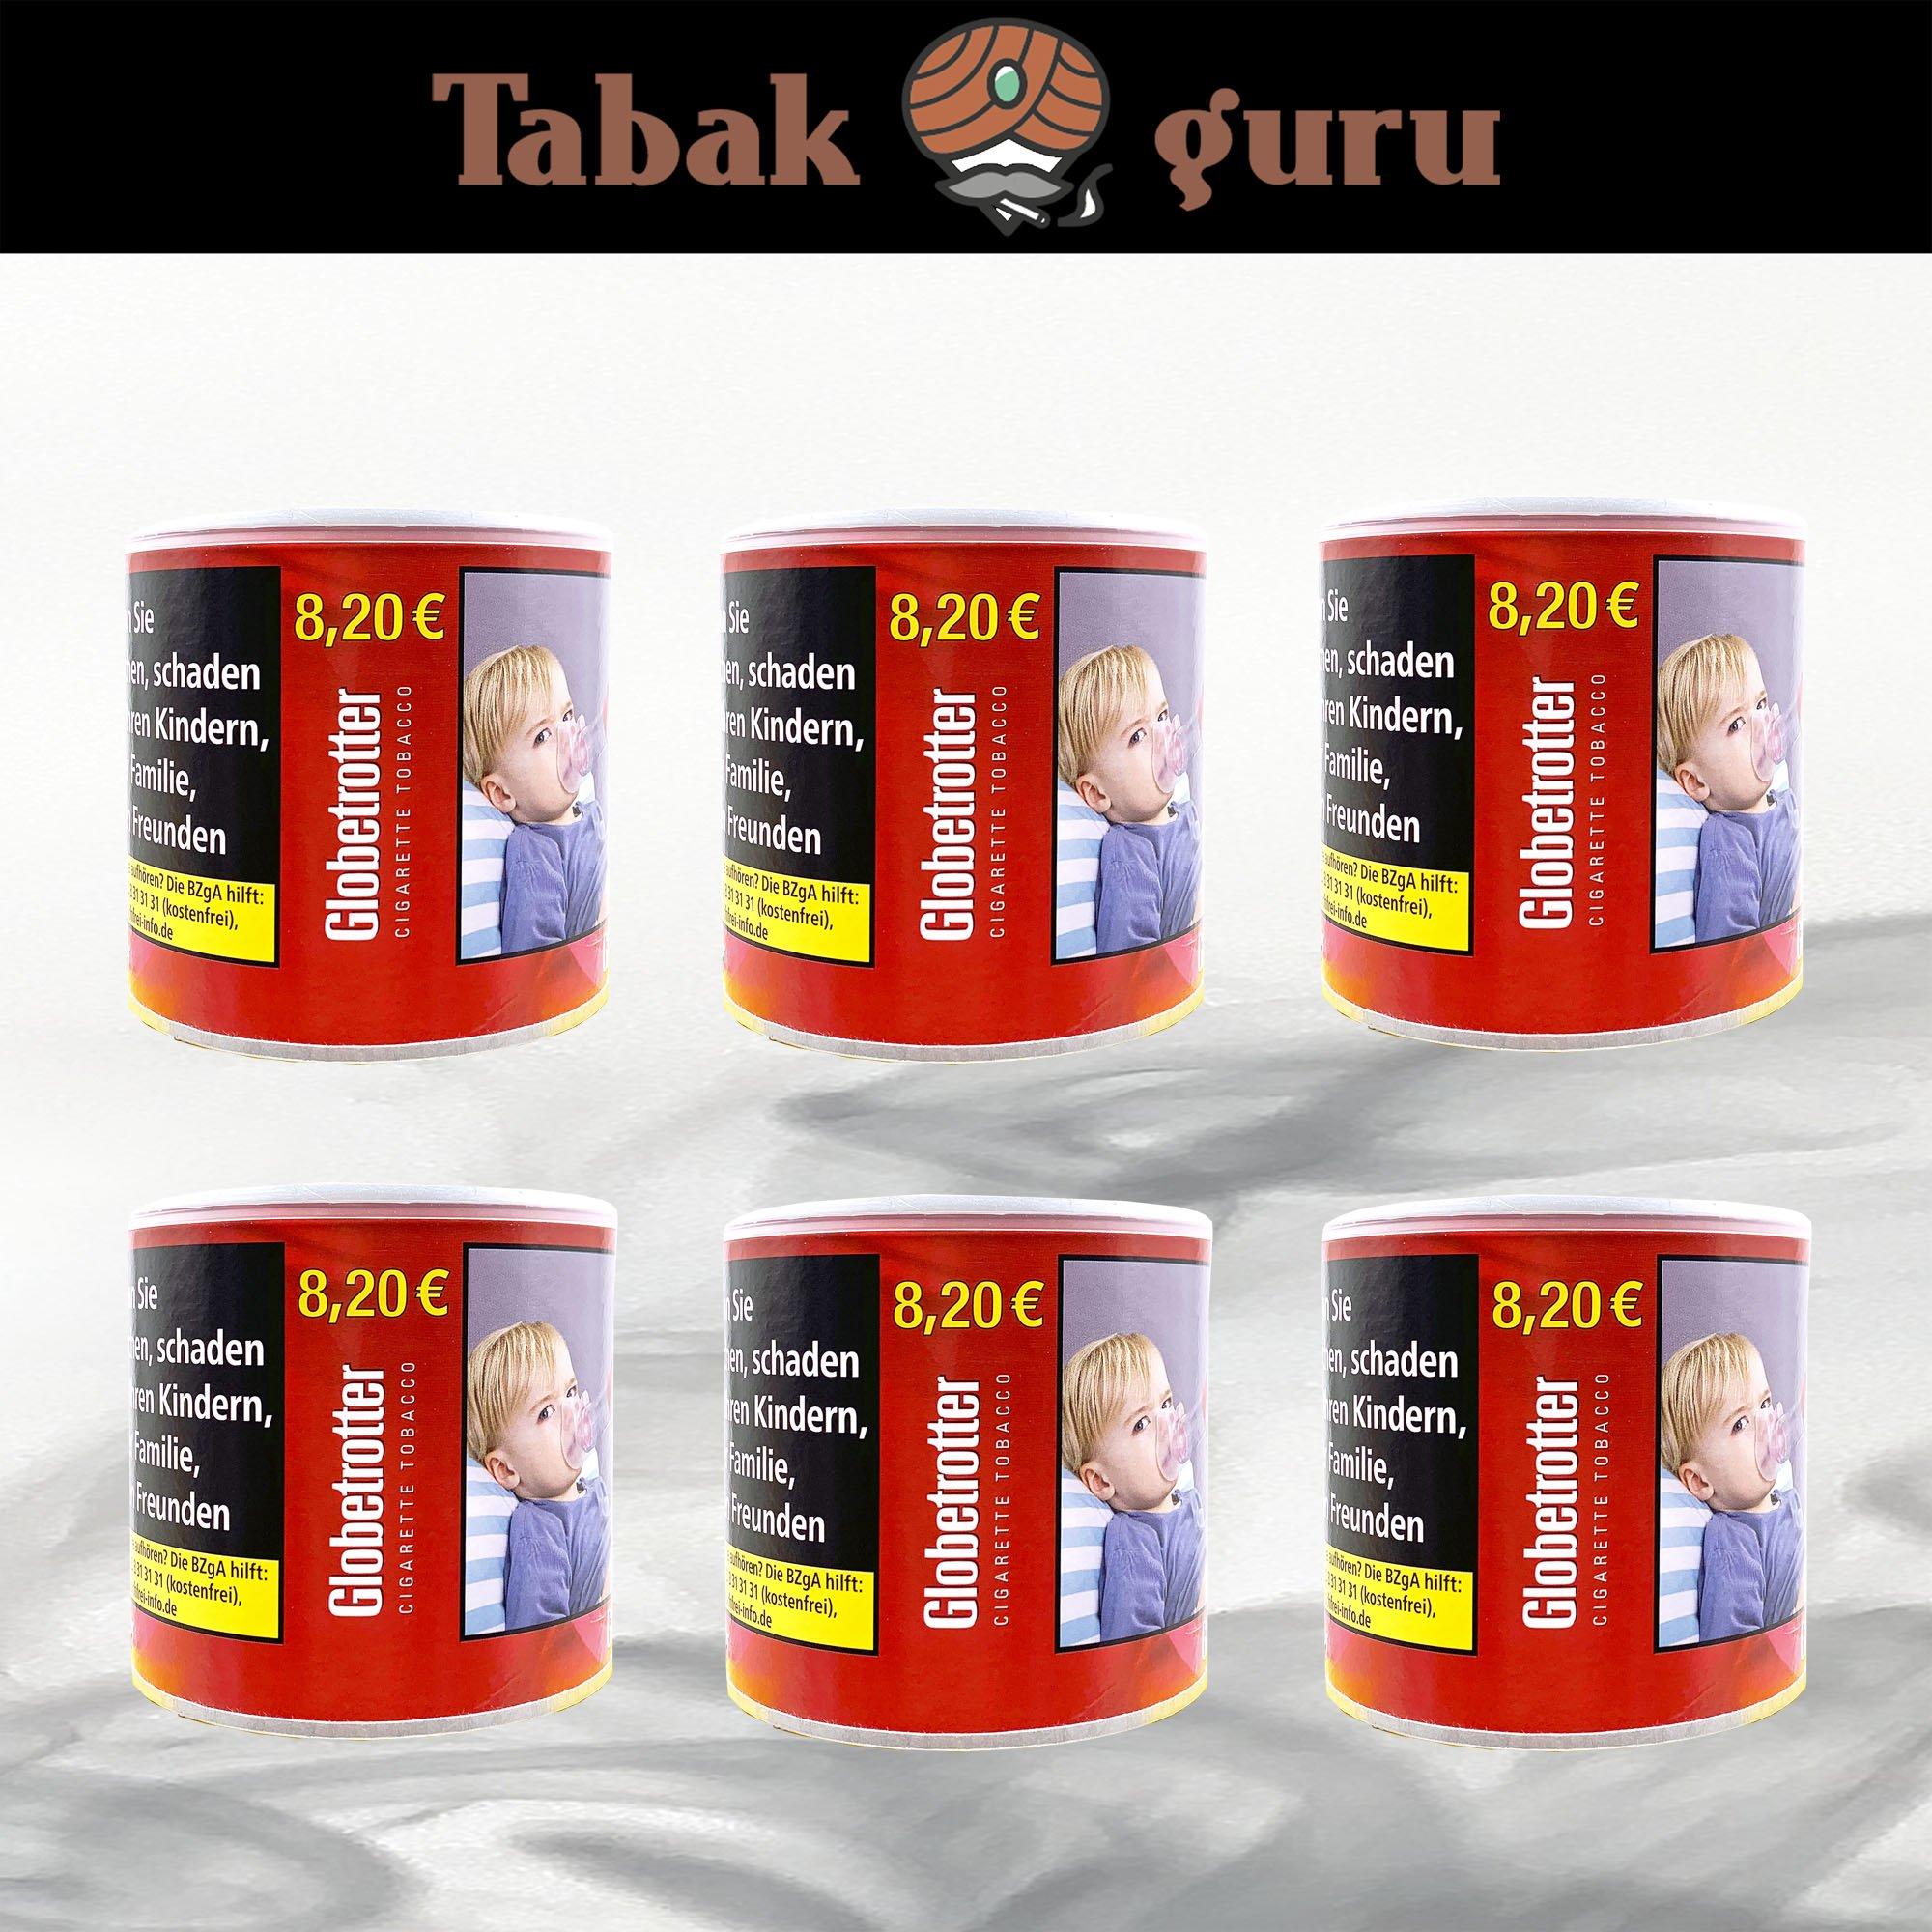 6 x Globetrotter Red Zigarettentabak, Volumentabak, 70g Dose